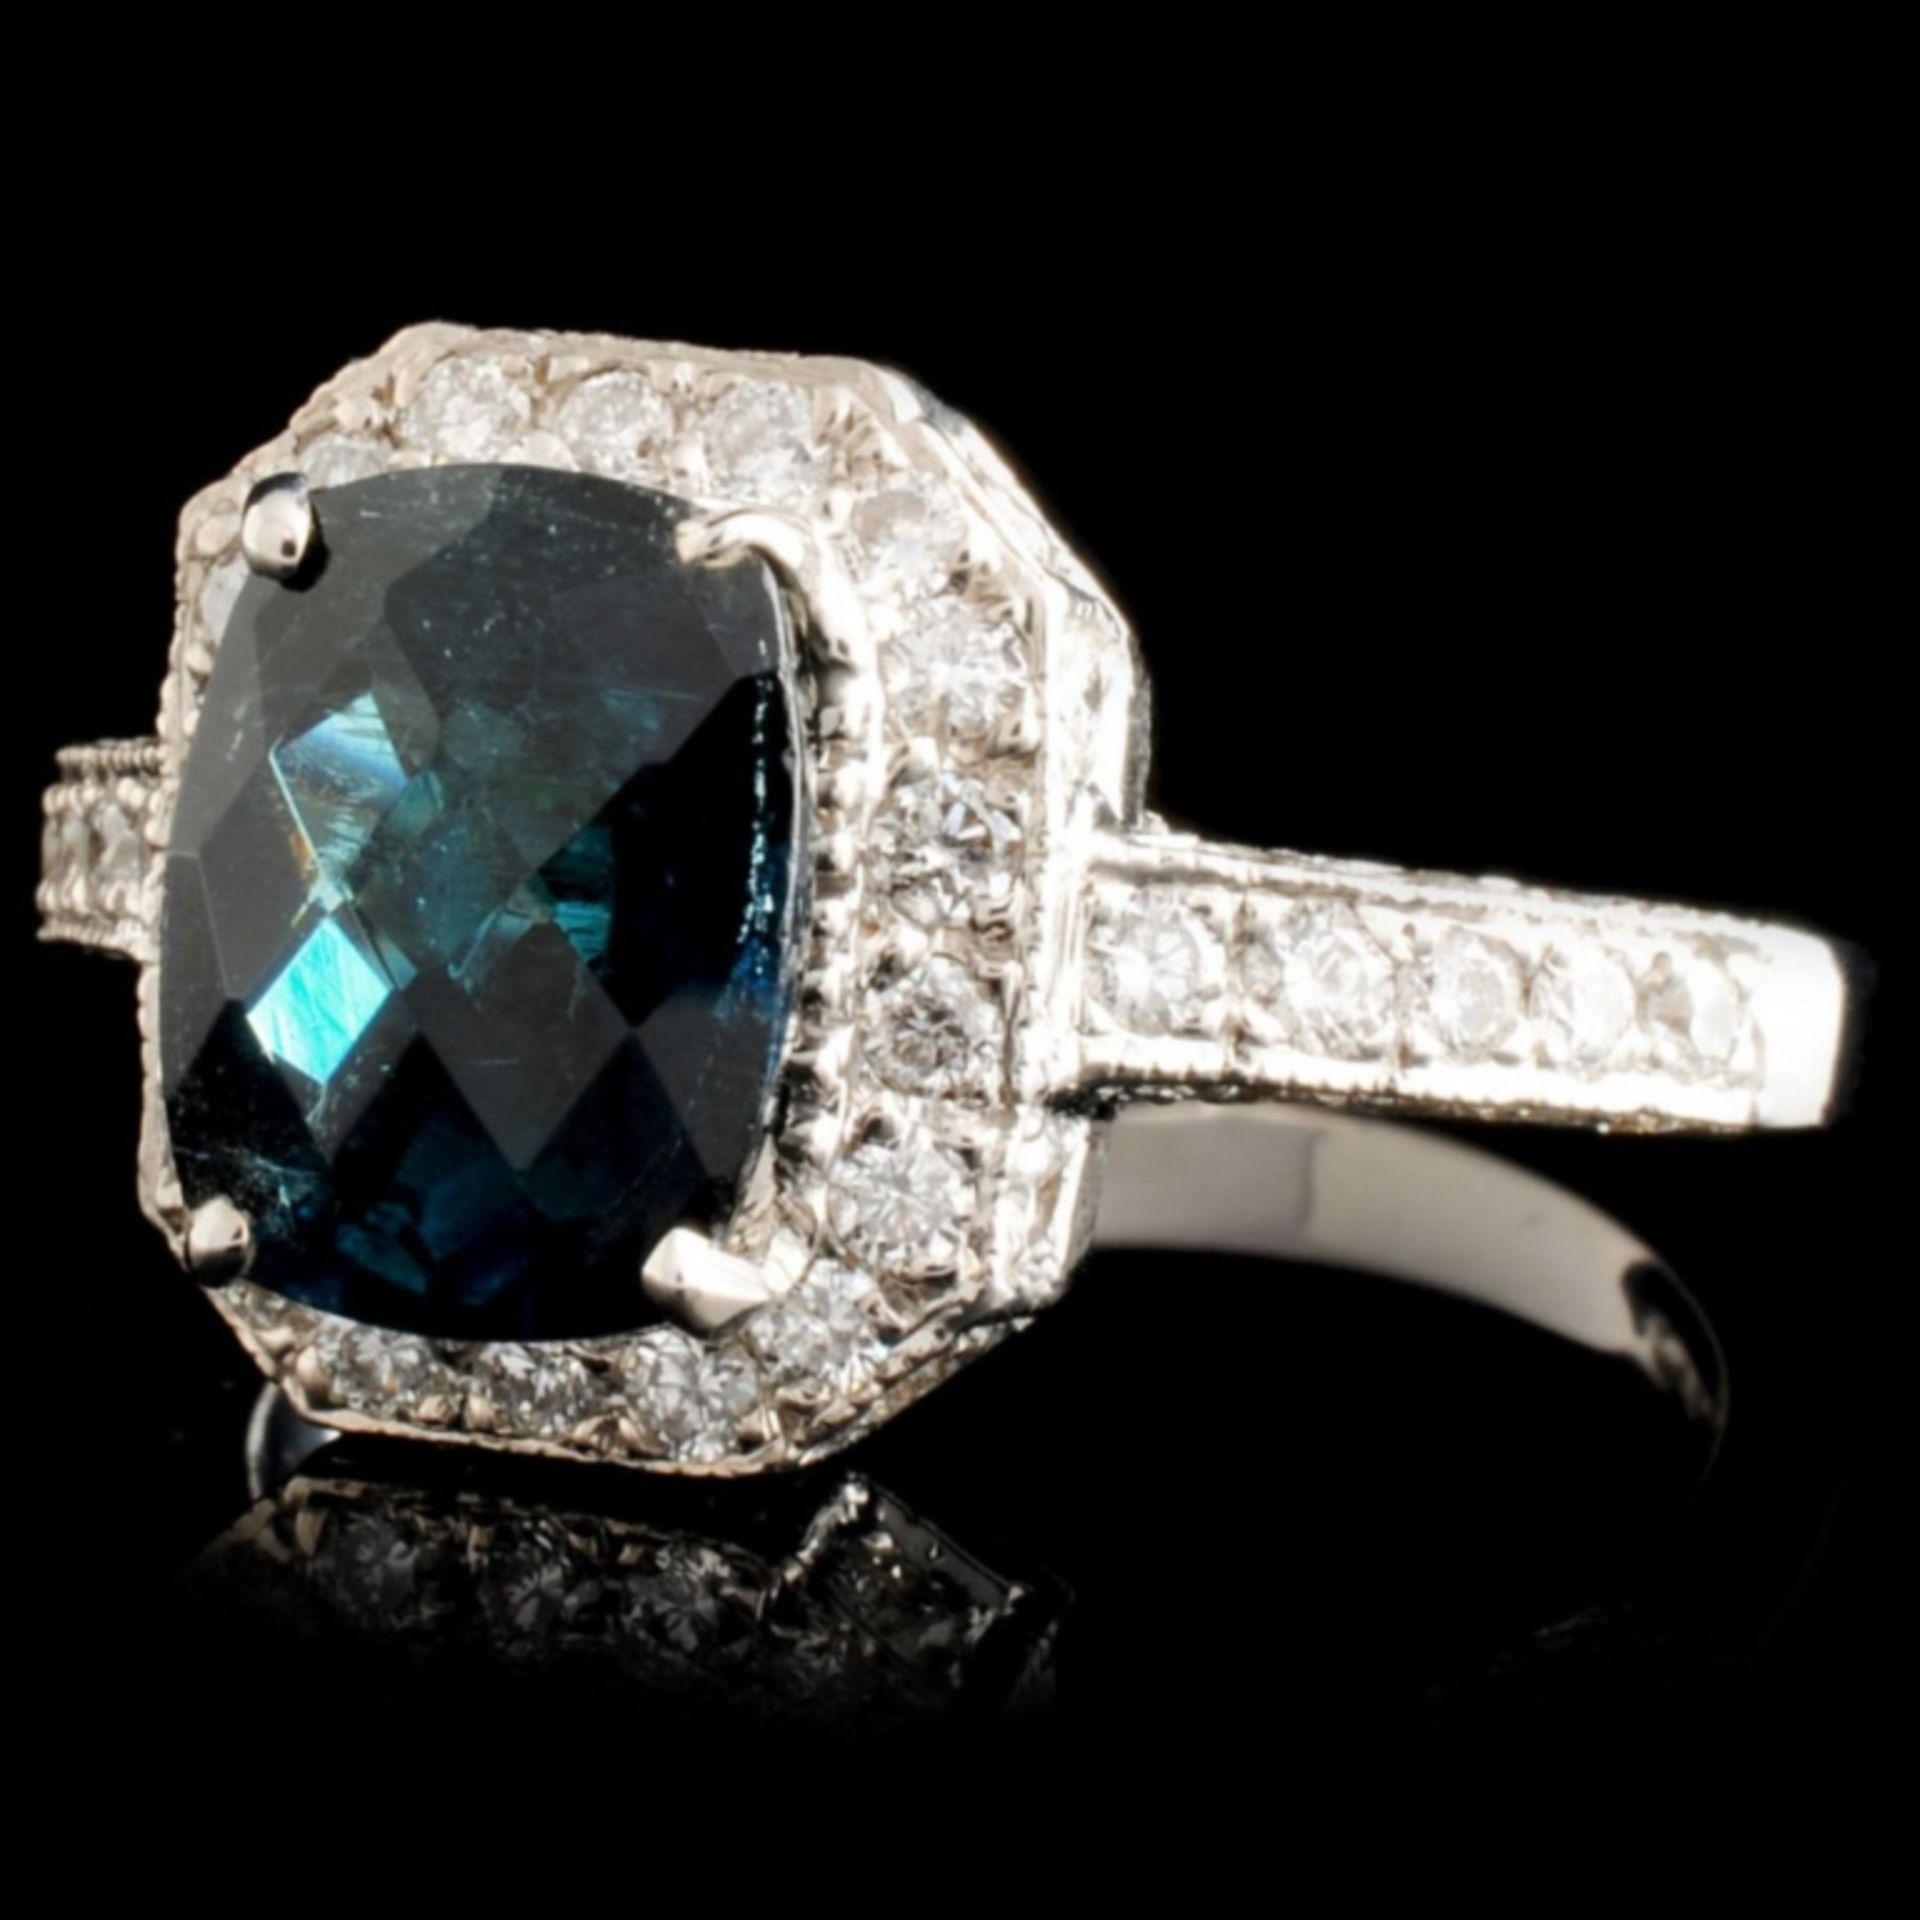 18K Gold 2.50ct Tourmaline & 0.80ctw Diamond Ring - Image 2 of 3